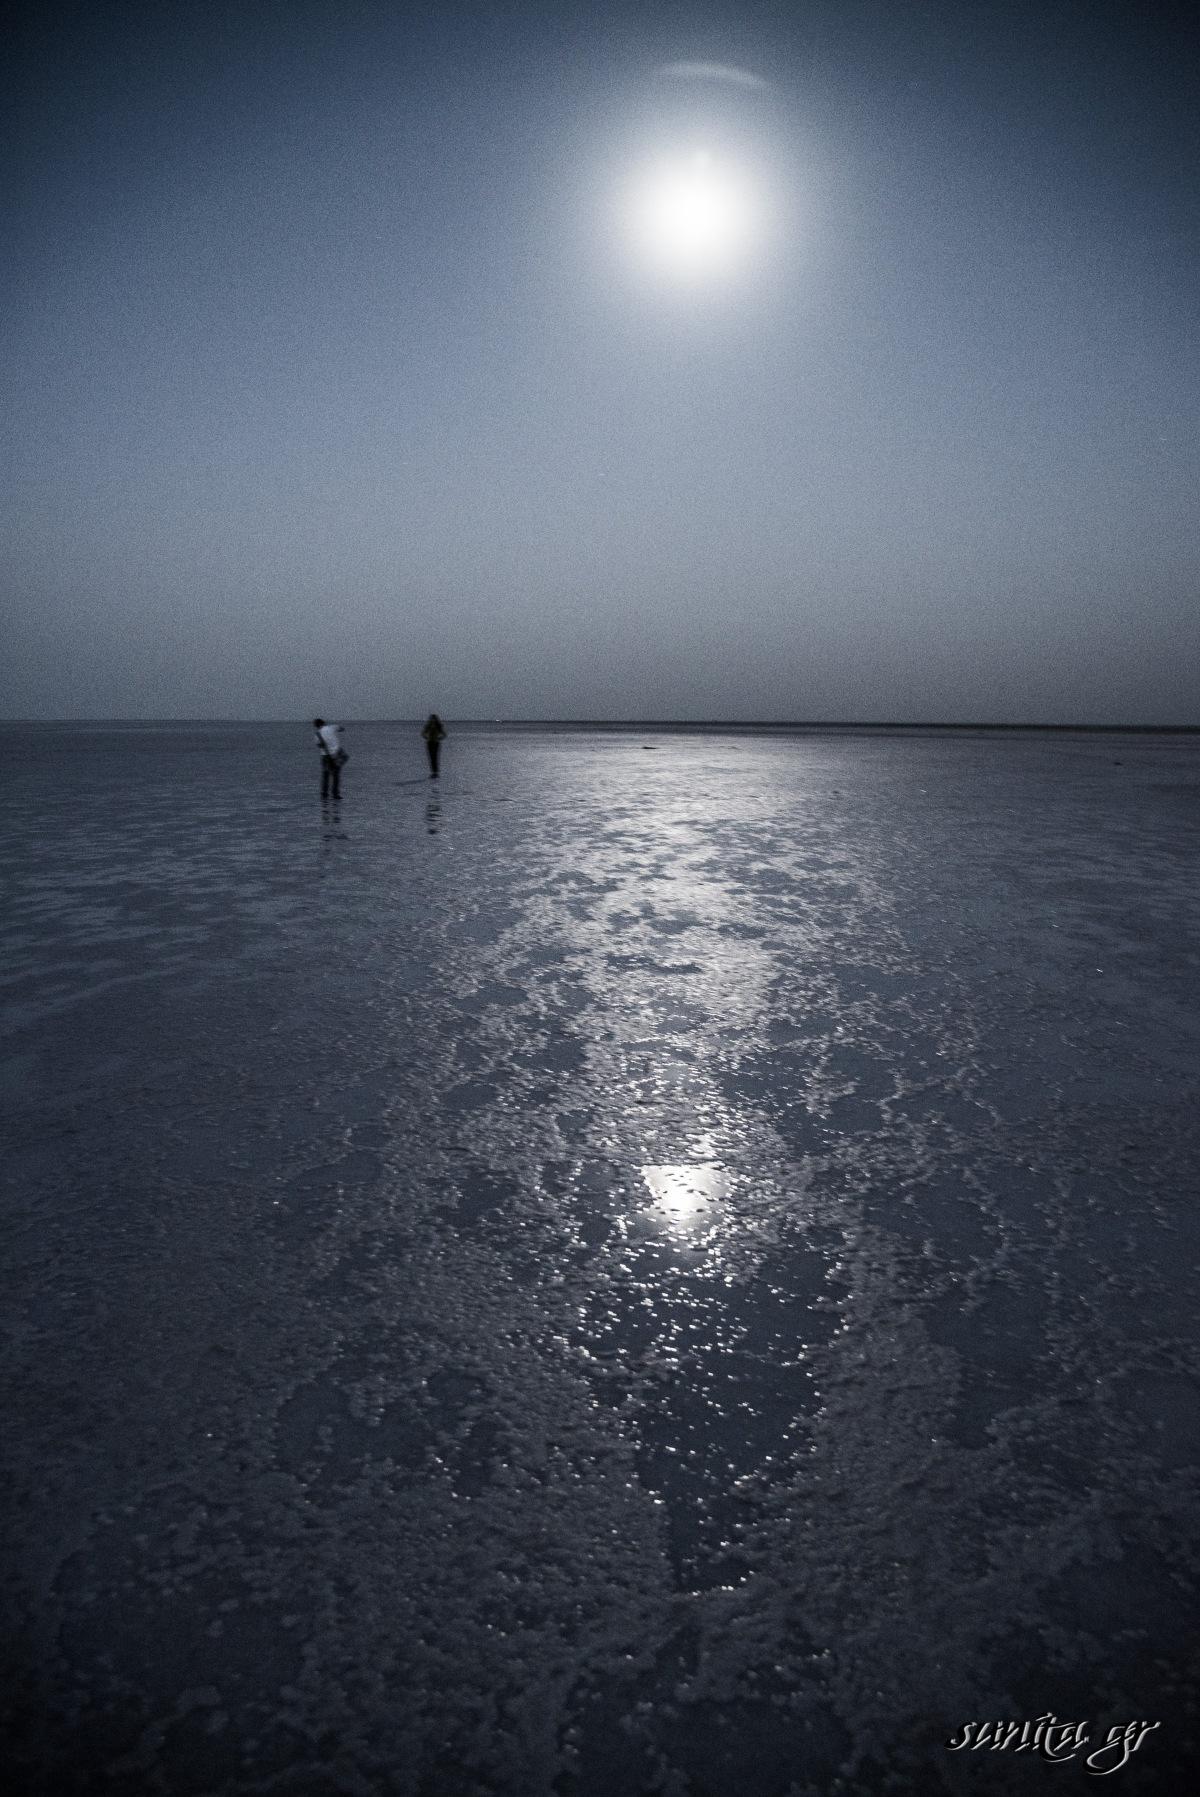 #Rann of Kutch, #india, #gujarat, #introspection, #kutch, #moonlight, #rann, #nature, #nightphotography, #photography, #serenity, #silence, #insignificance,  #travel, #travel photography, #salt desert, #white desert